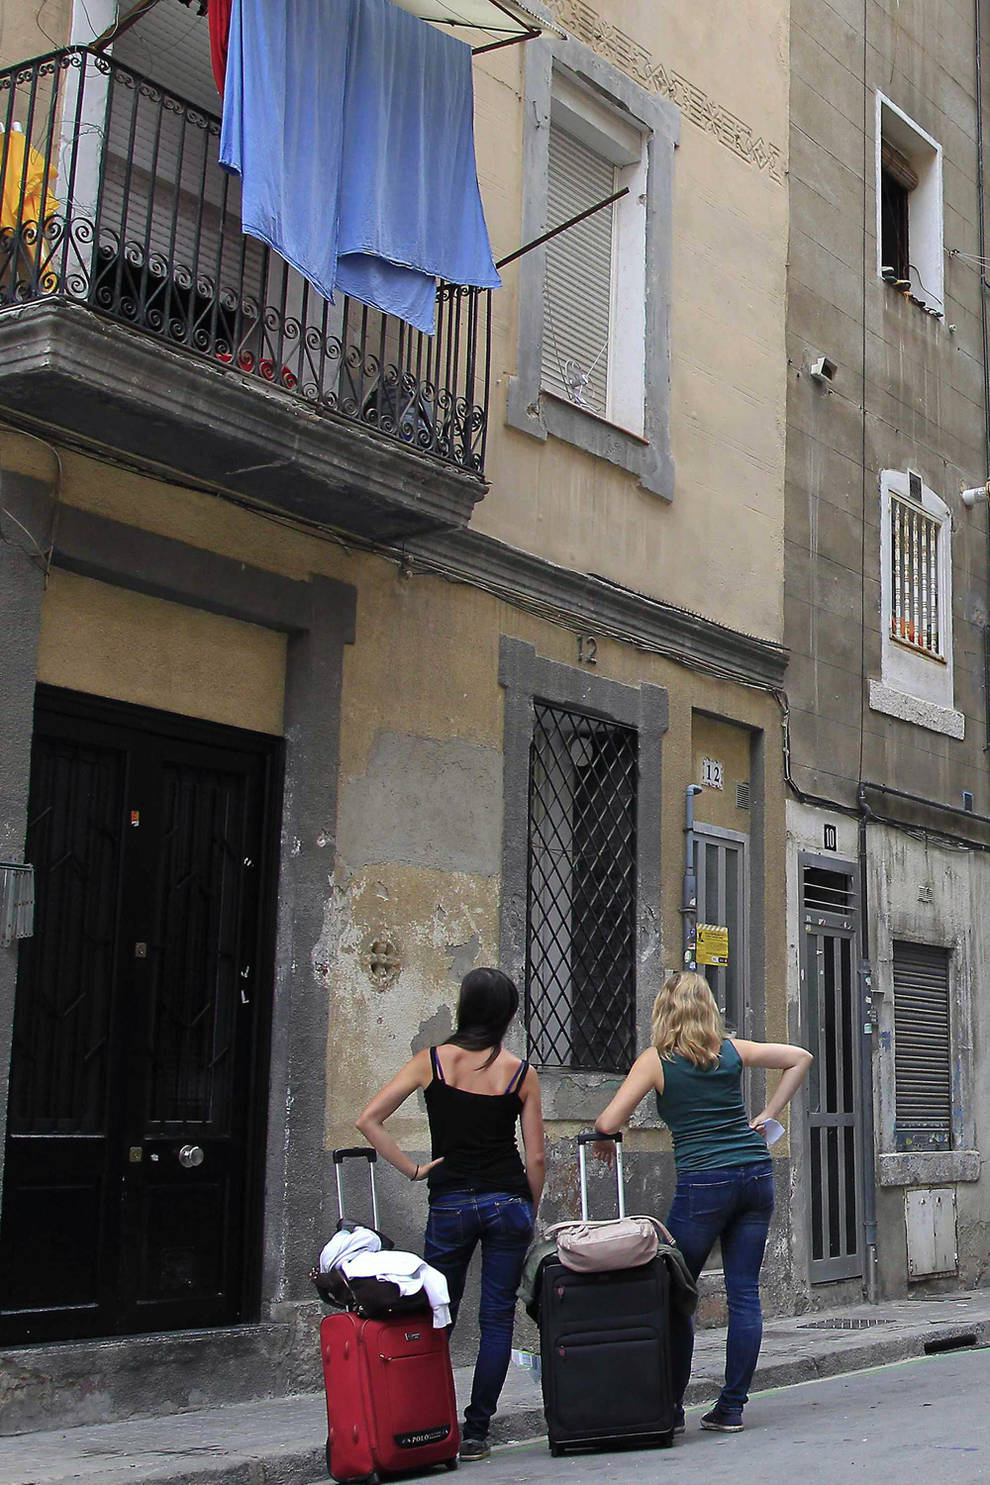 Economia barcelona cerrar 256 pisos tur sticos ilegales - Pisos turisticos barcelona ...